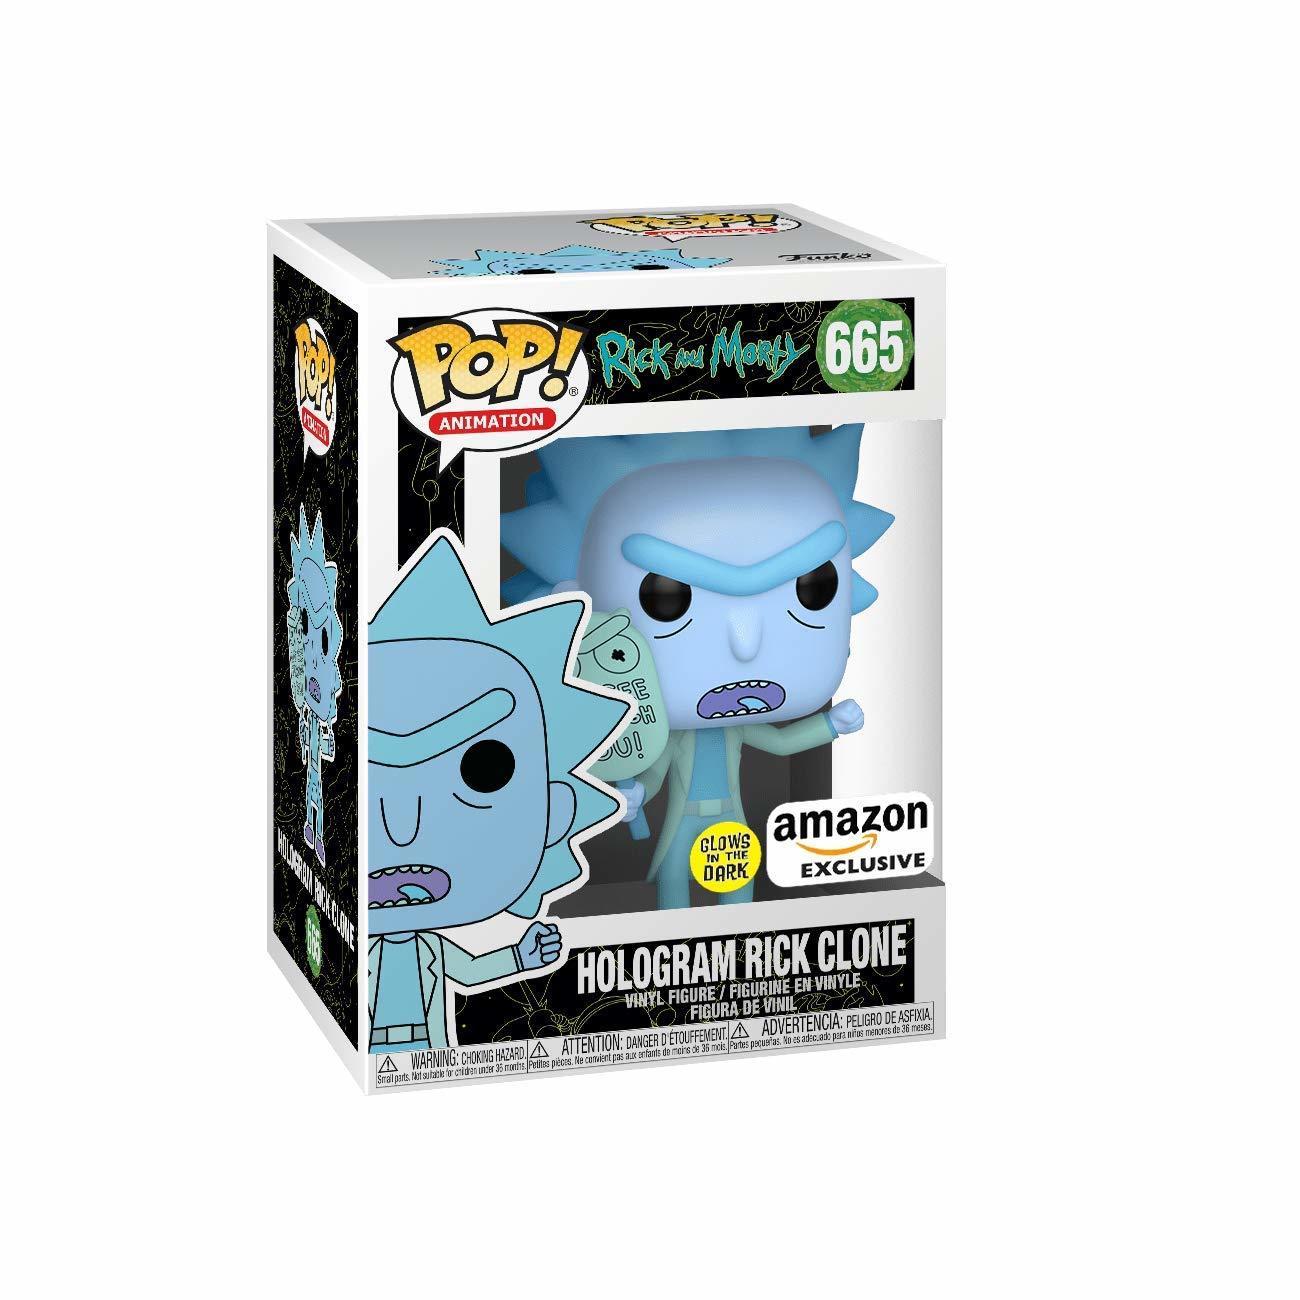 Hologram Rick Clone Gitd - Rick And Morty - Funko Pop! #665